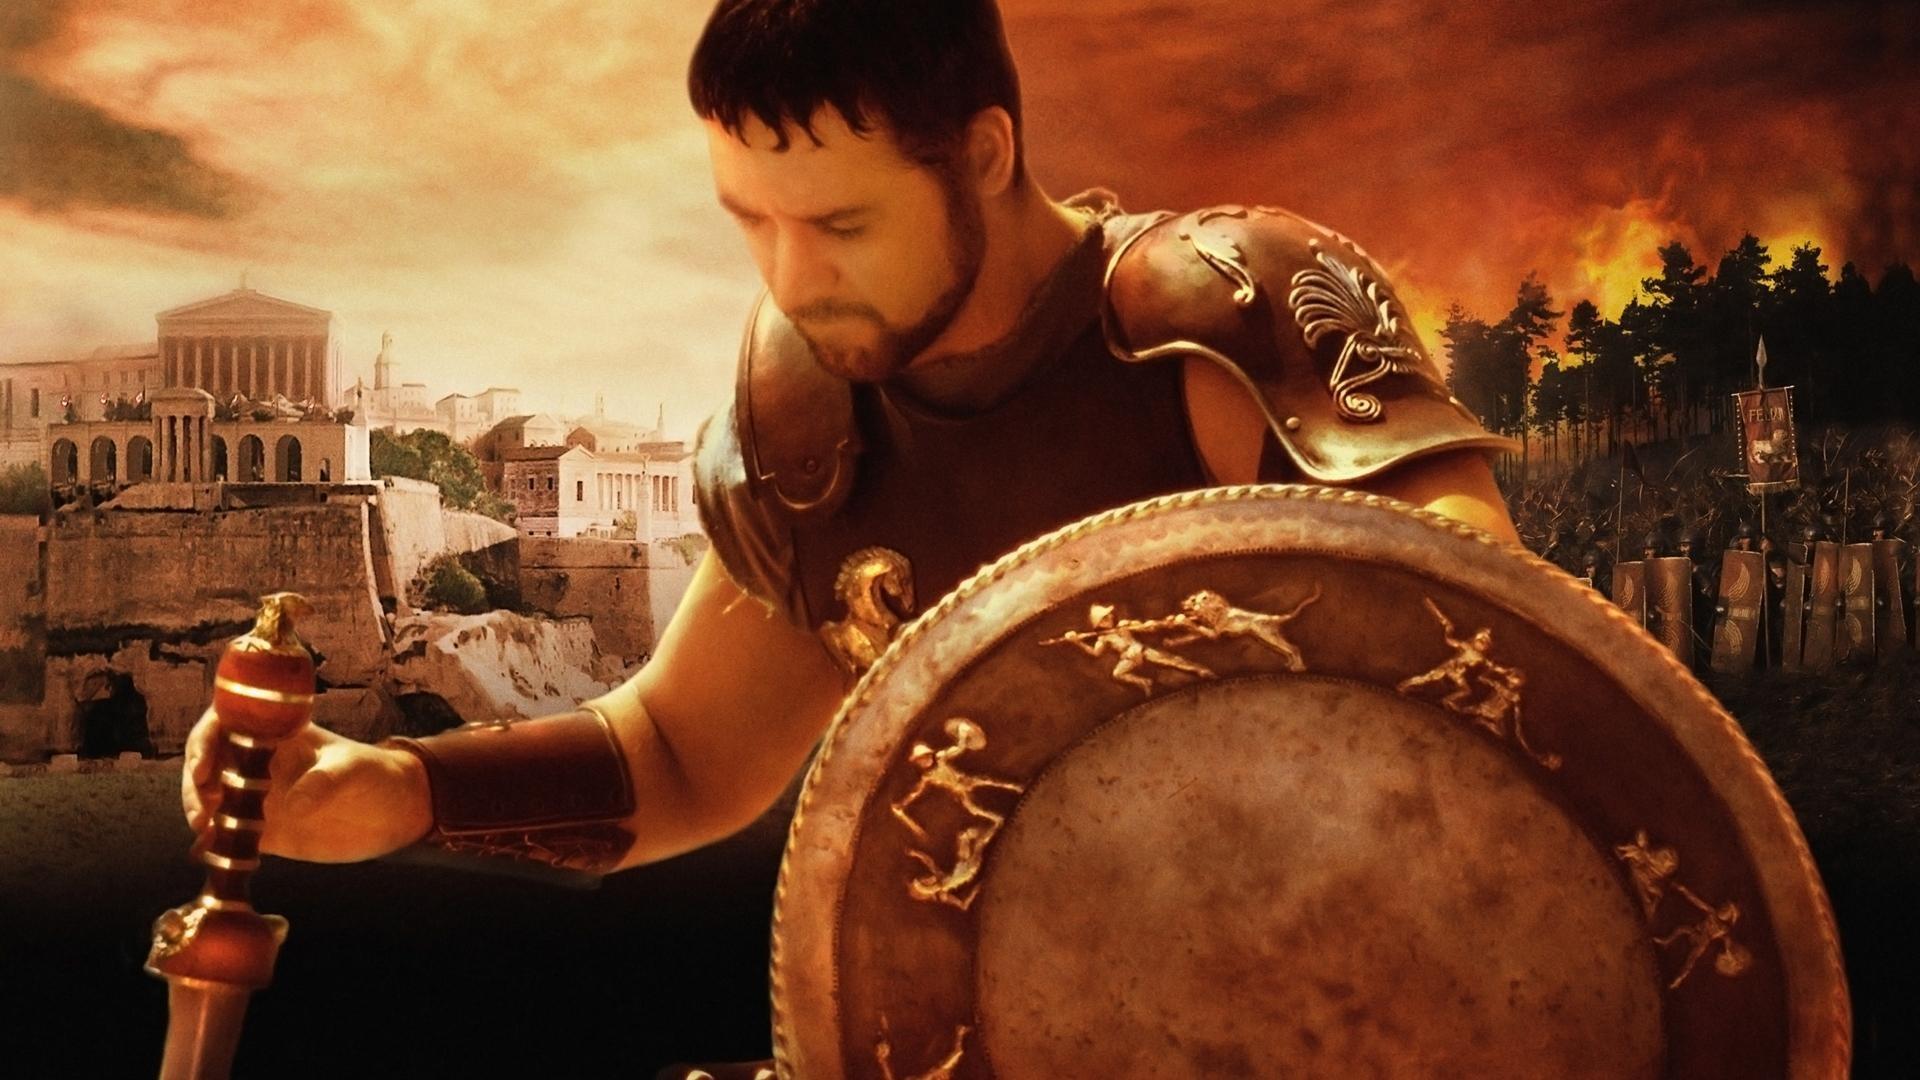 Gladiator desktop wallpaper